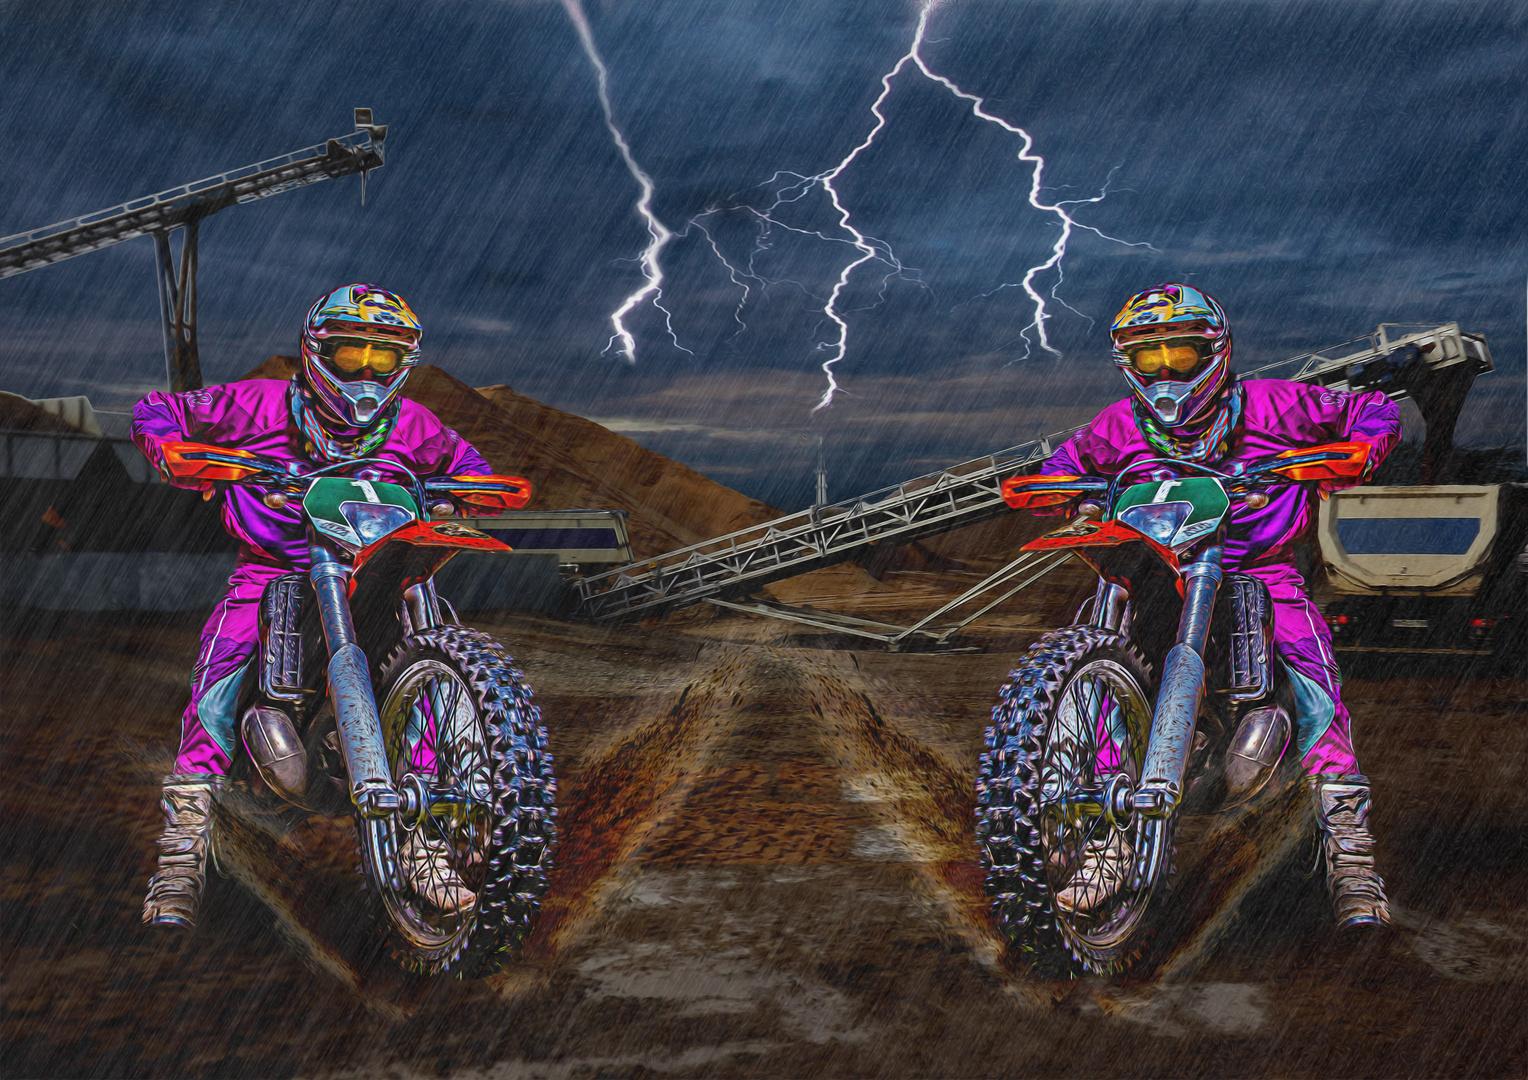 Der Motocrosser